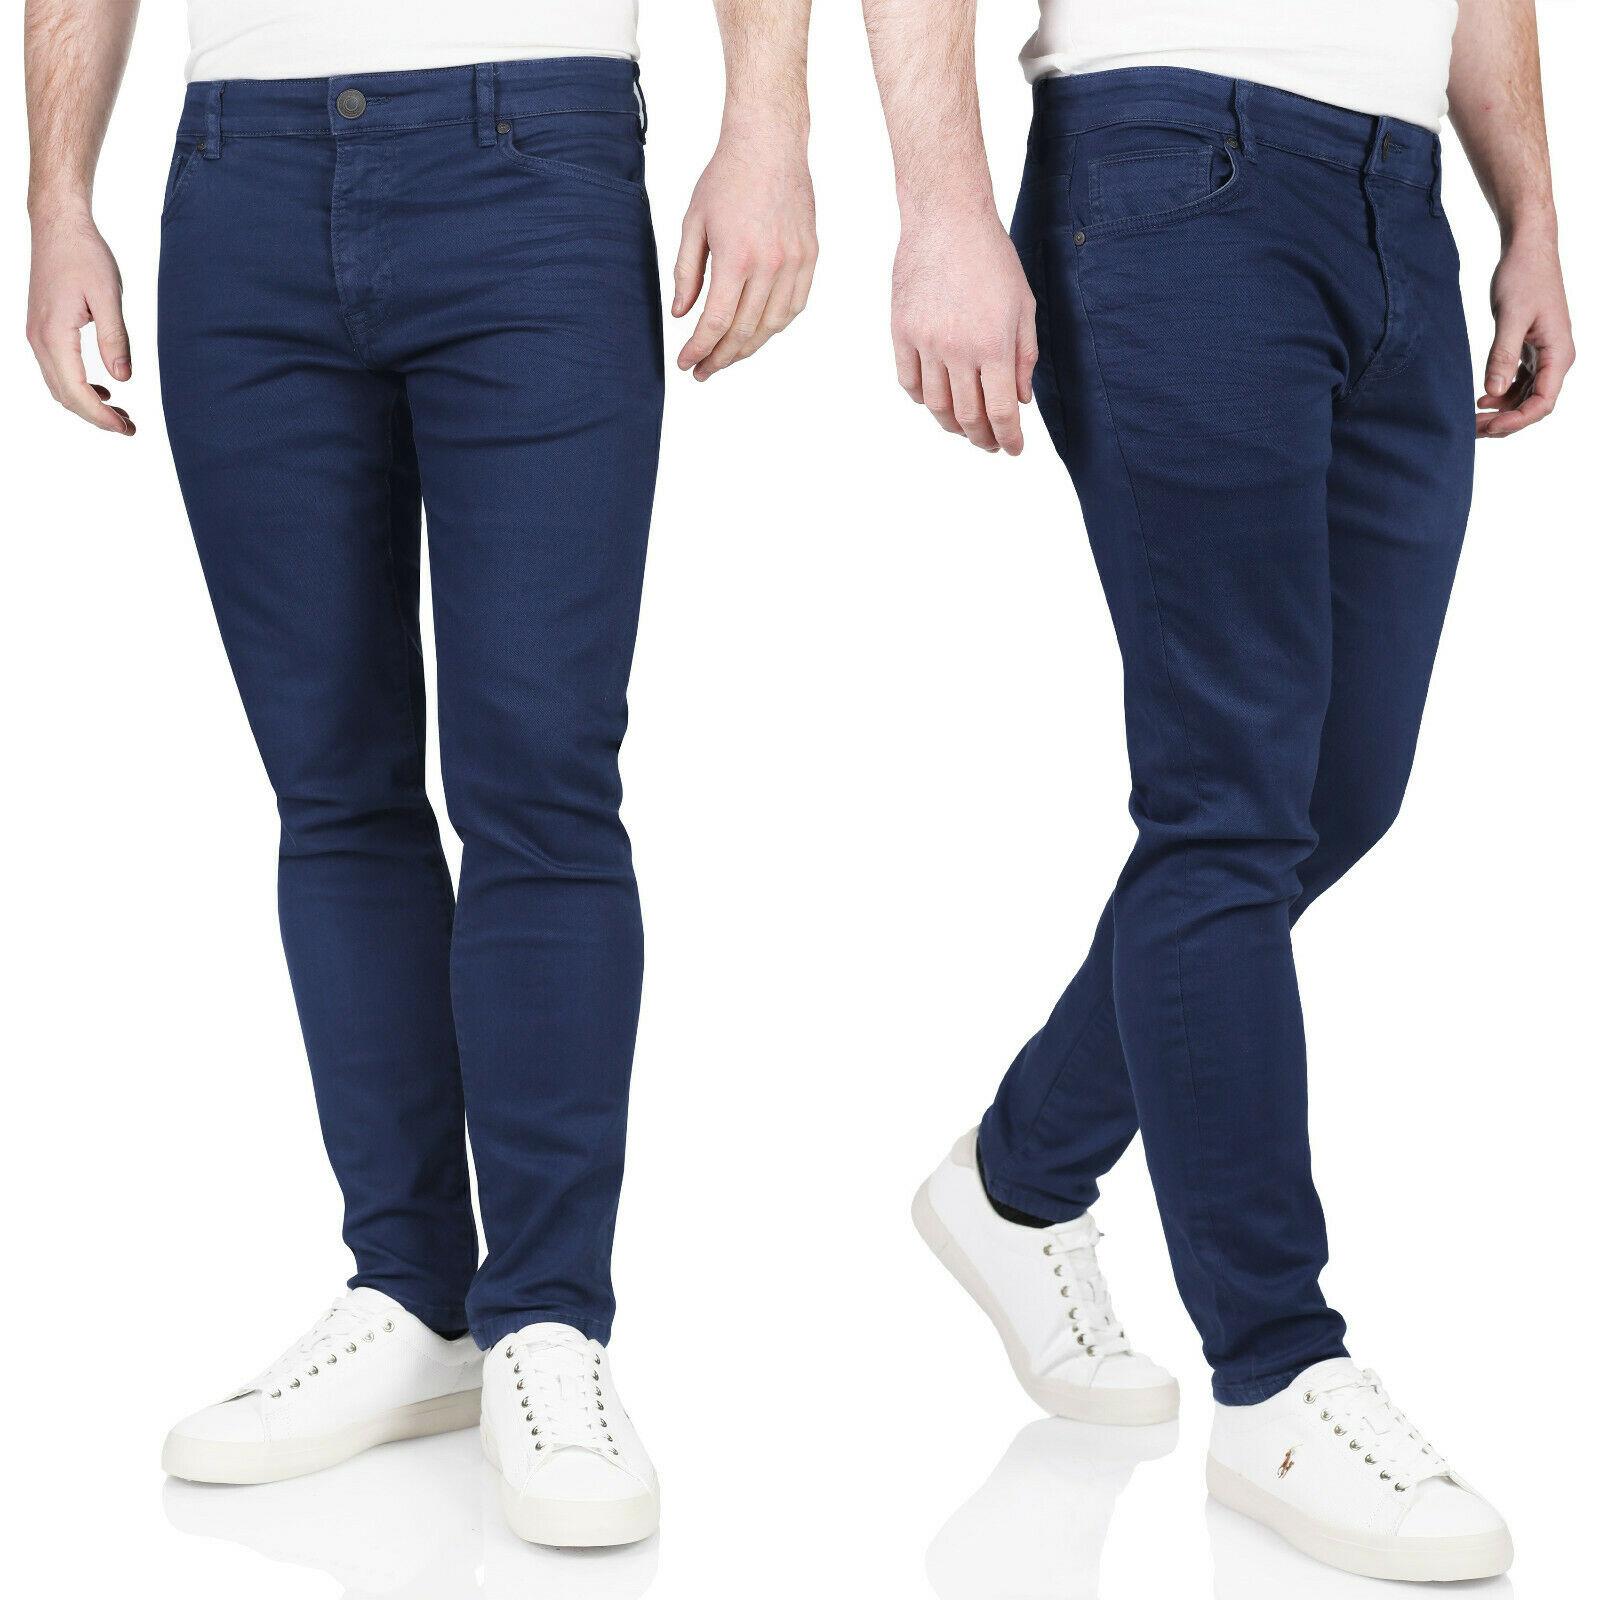 Kruze Mens Skinny Stretch Jeans Slim Fit Flex Denim Trousers Pants All Waists